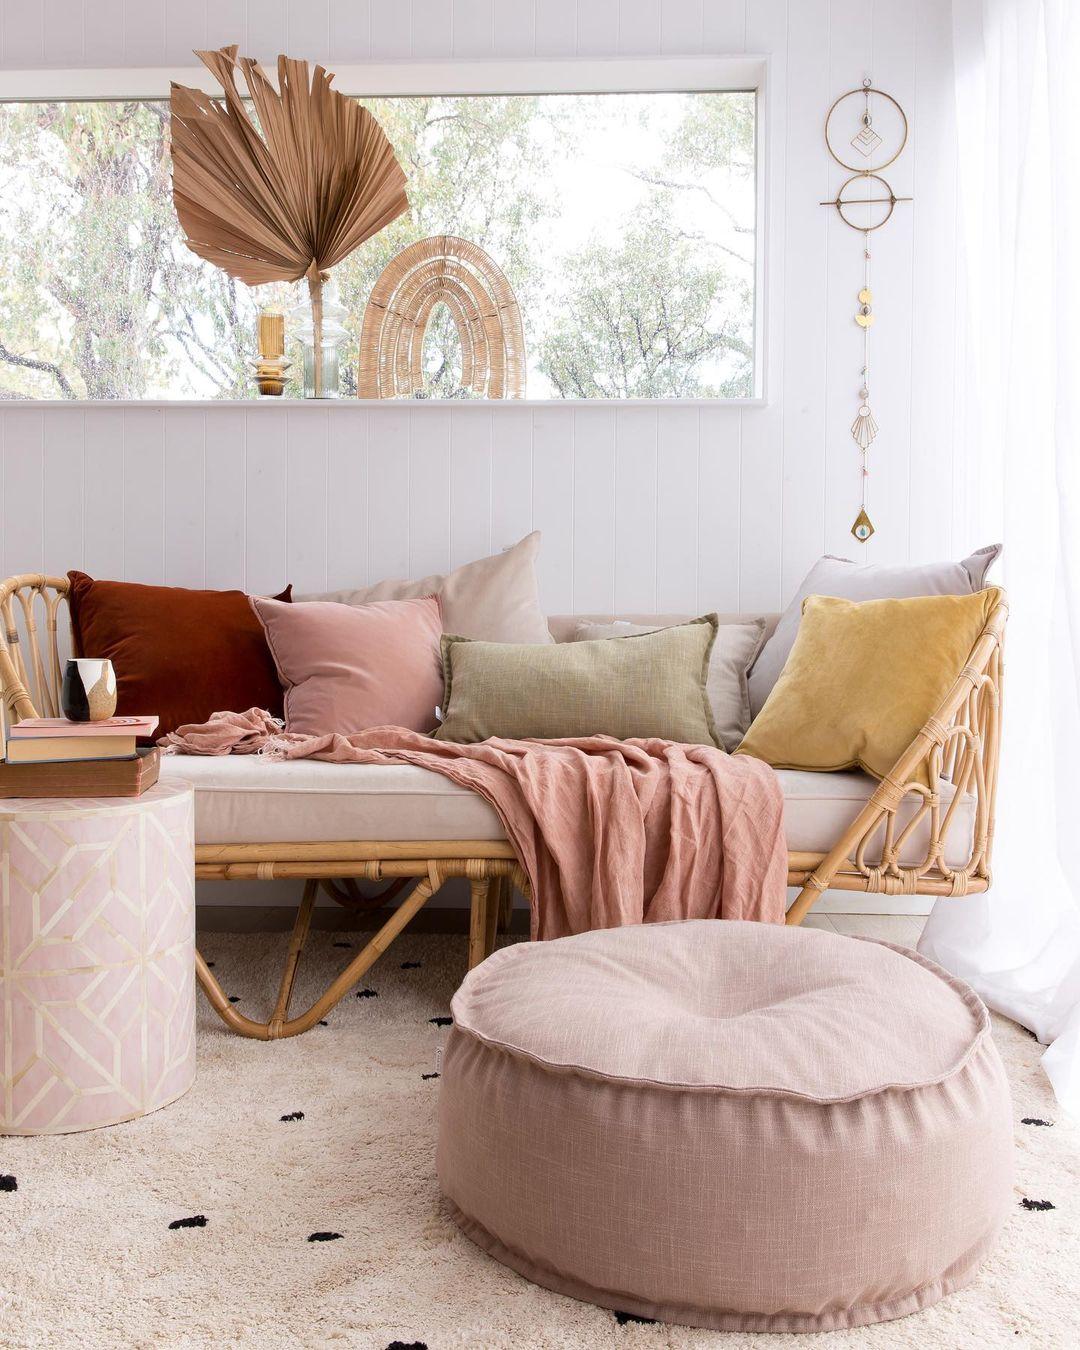 Boho-Style Interior Design Ideas to Freshen Up Your Home